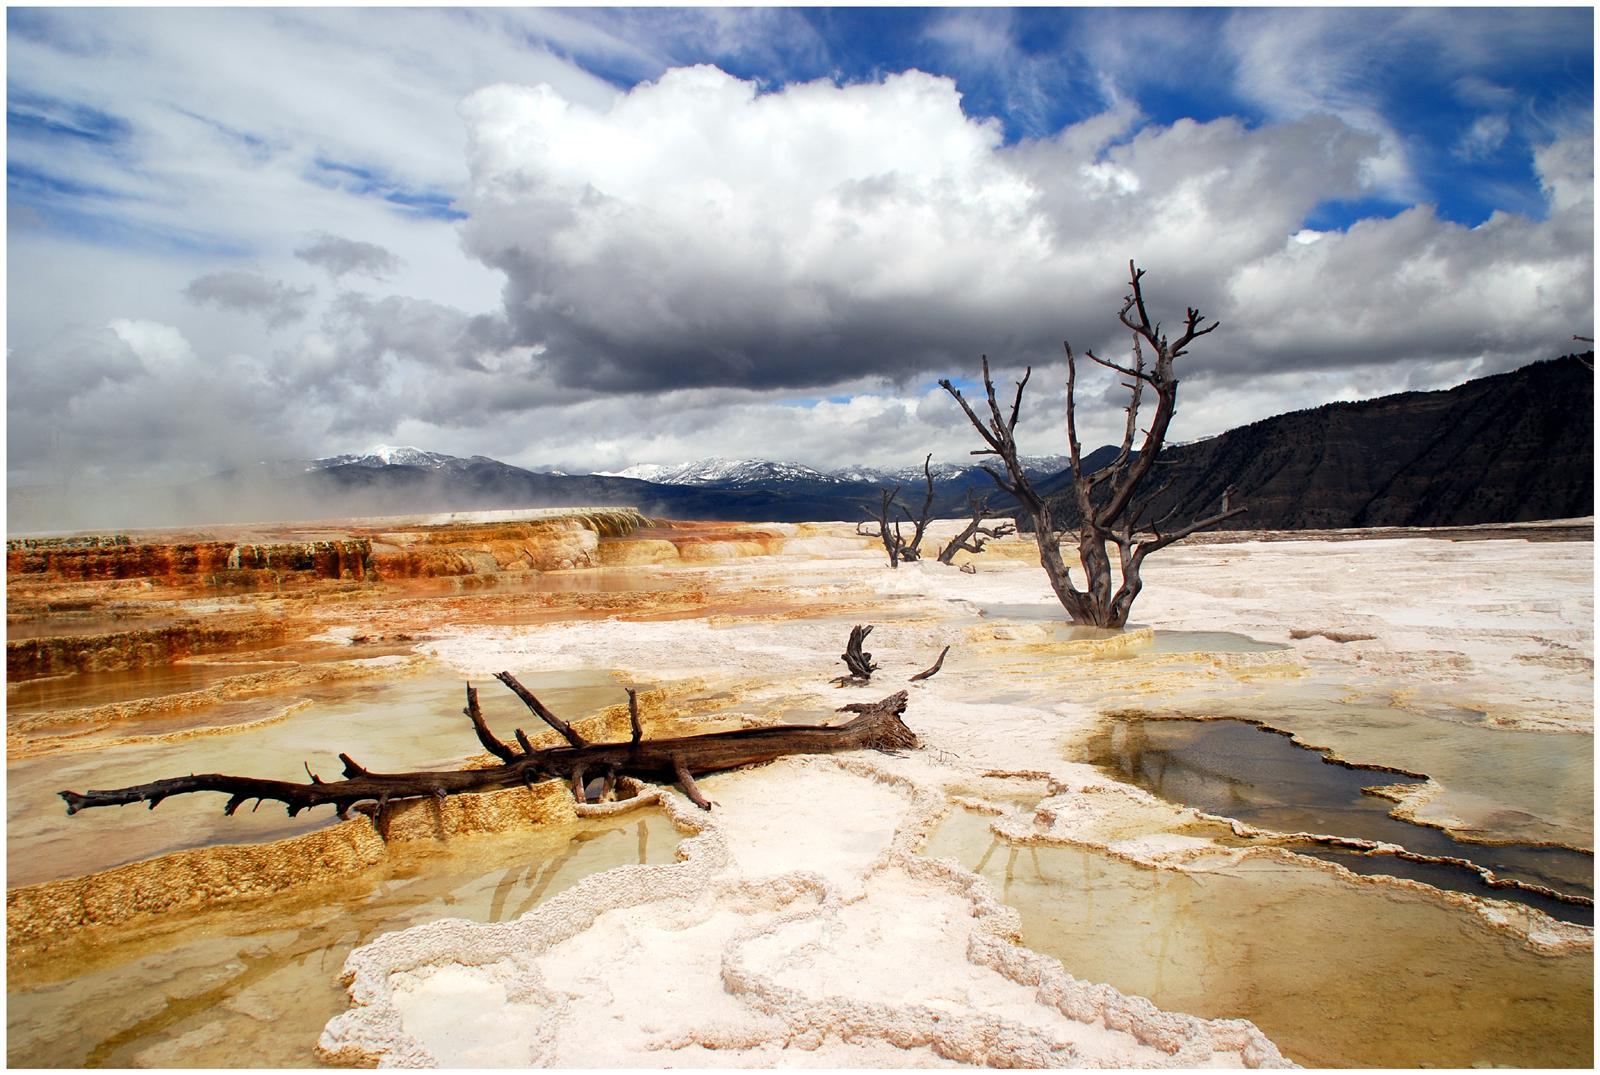 das etwas andere Dead Vlei - Mammoth Hot Springs, Yellowstone